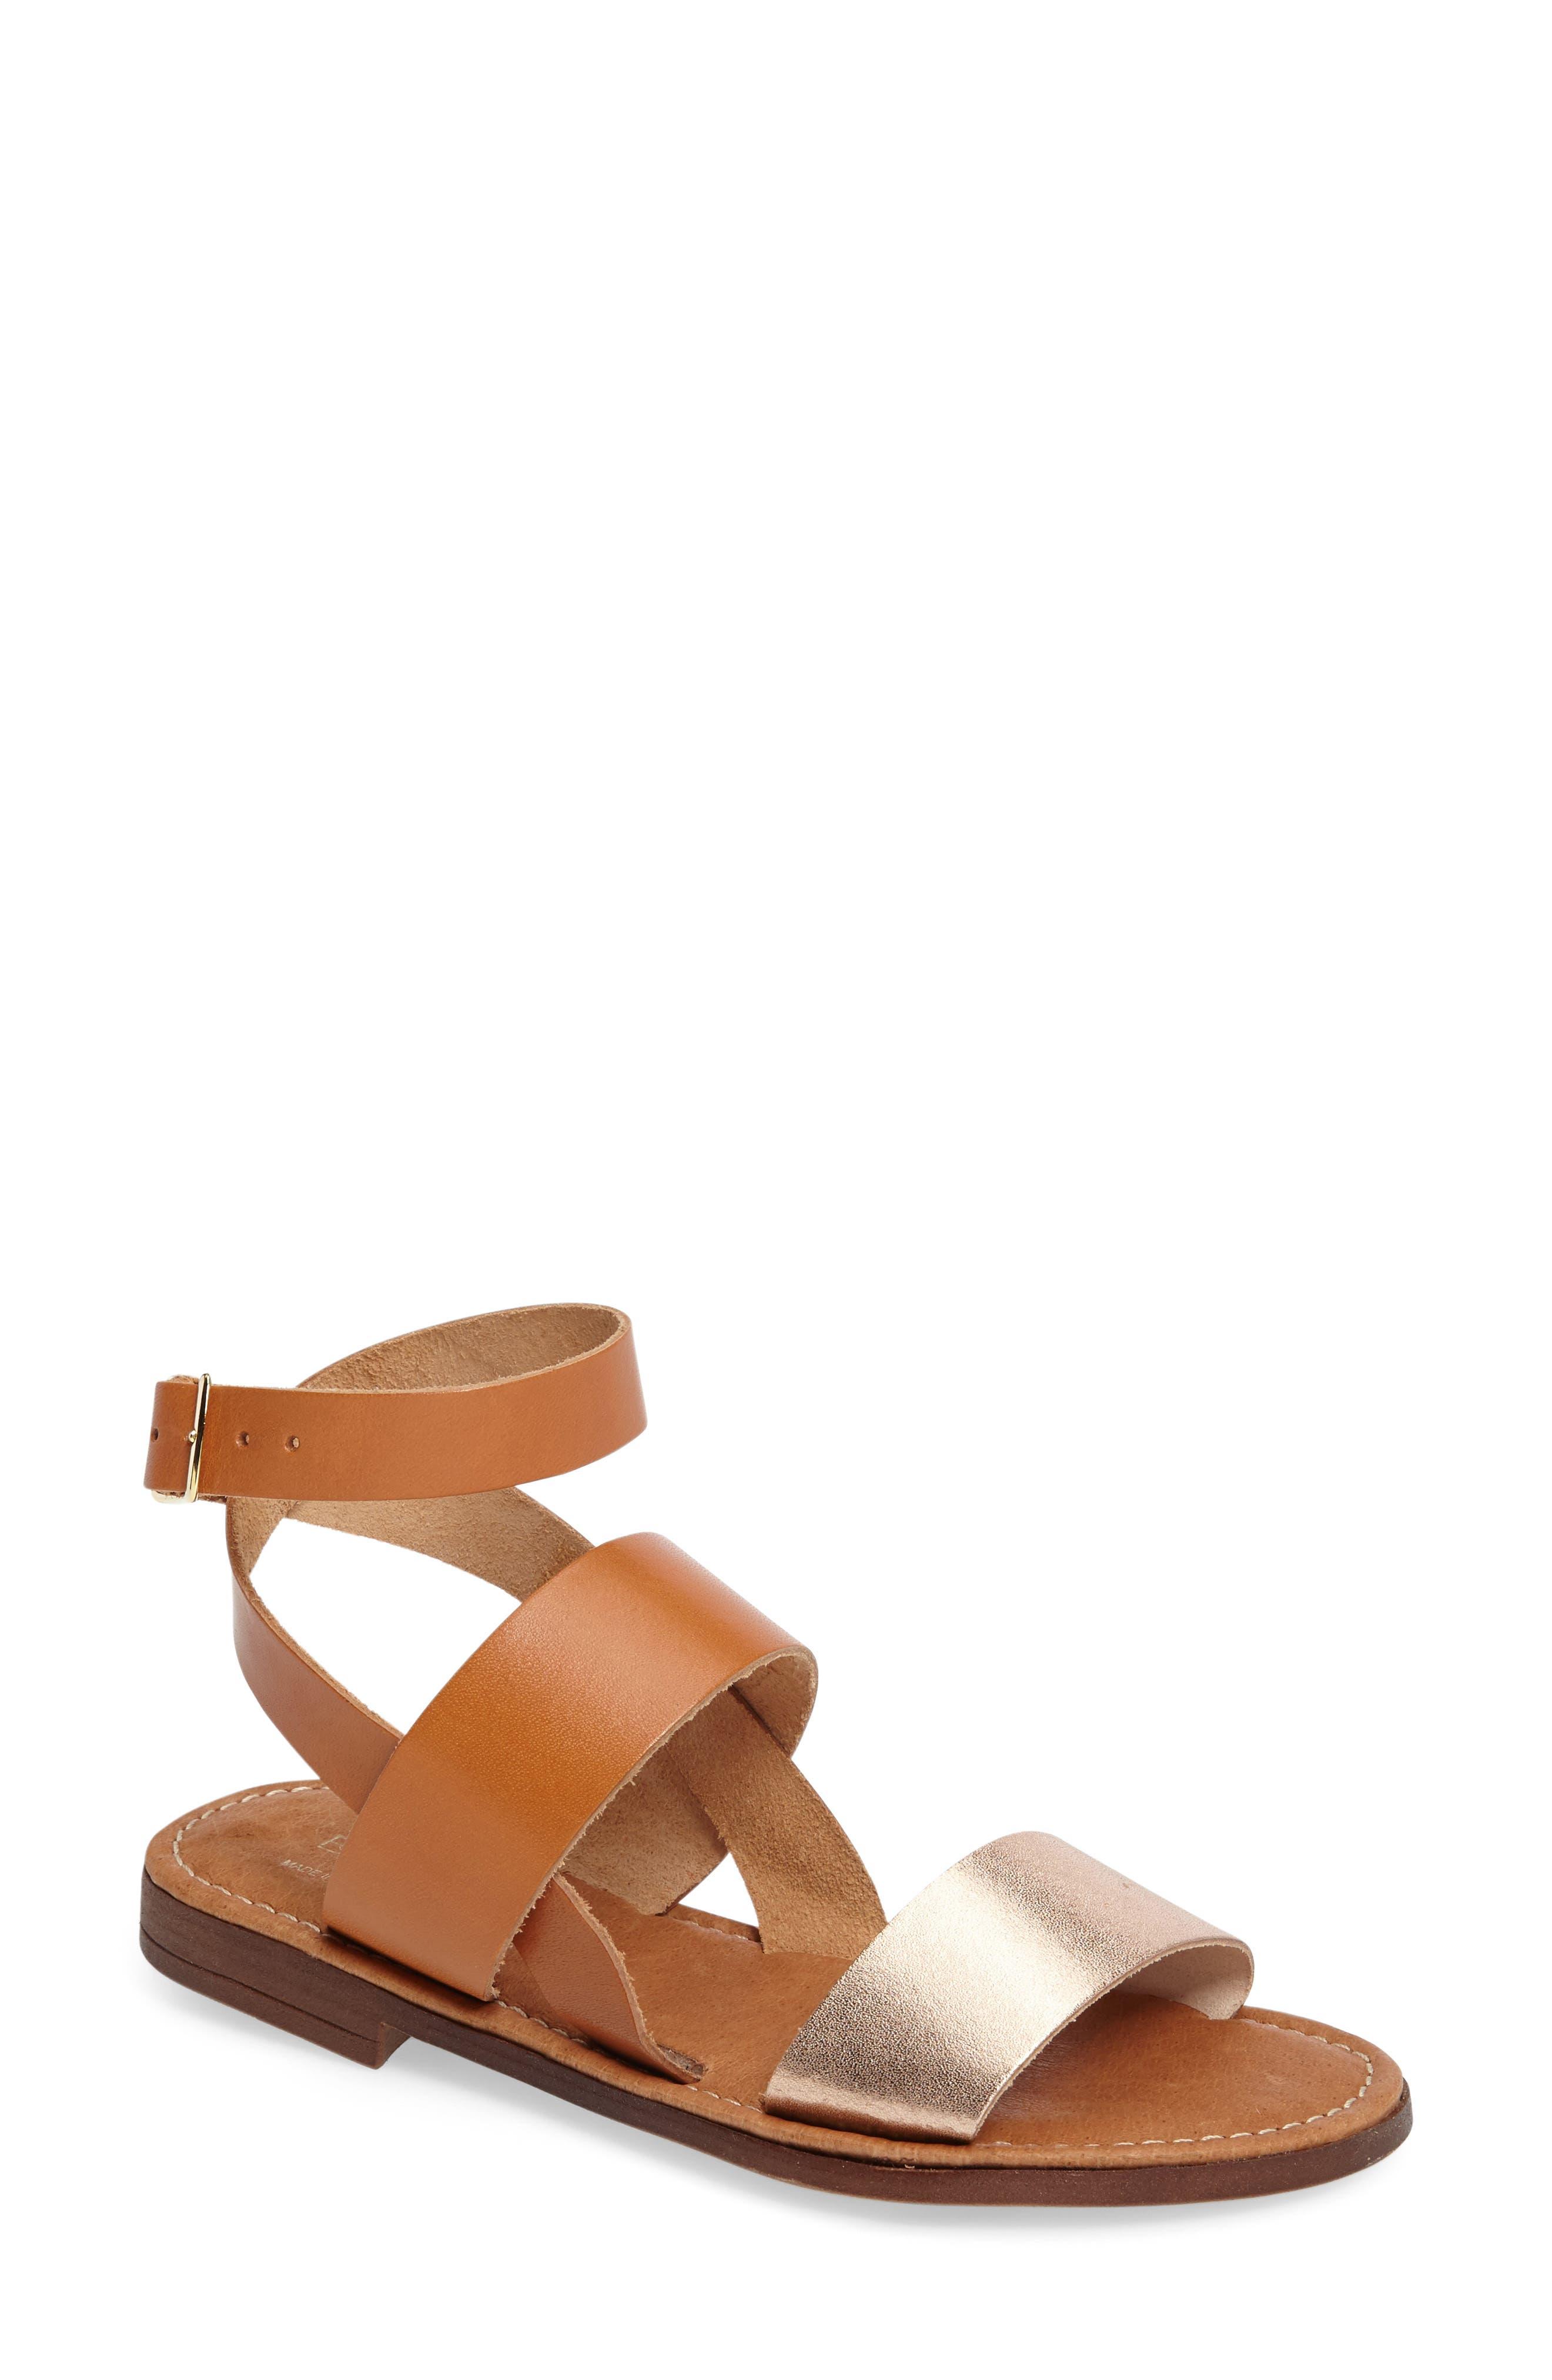 BOS. & CO. Ivory Sandal